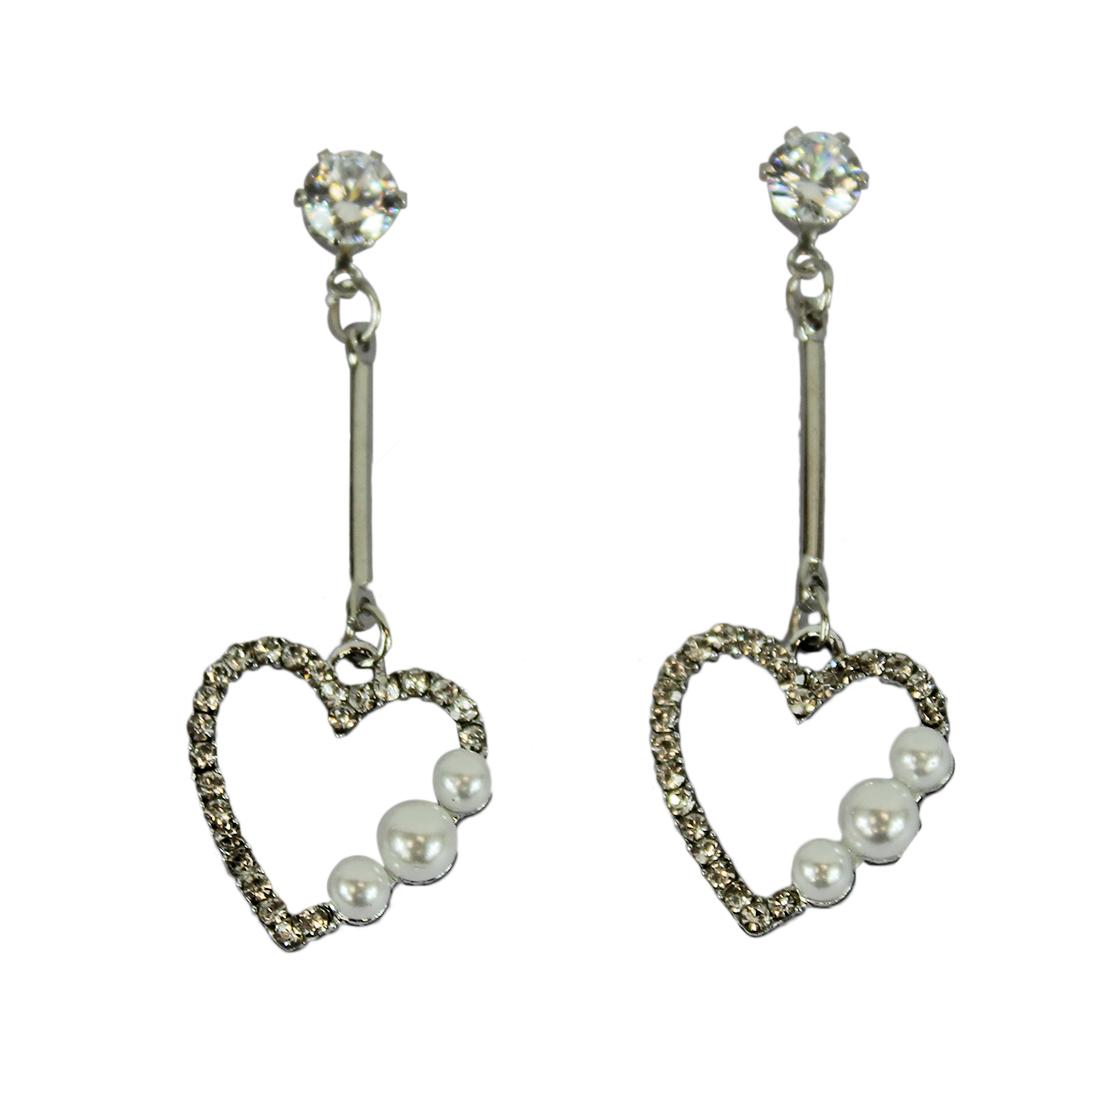 Star deisgn with small pearls & diamonds